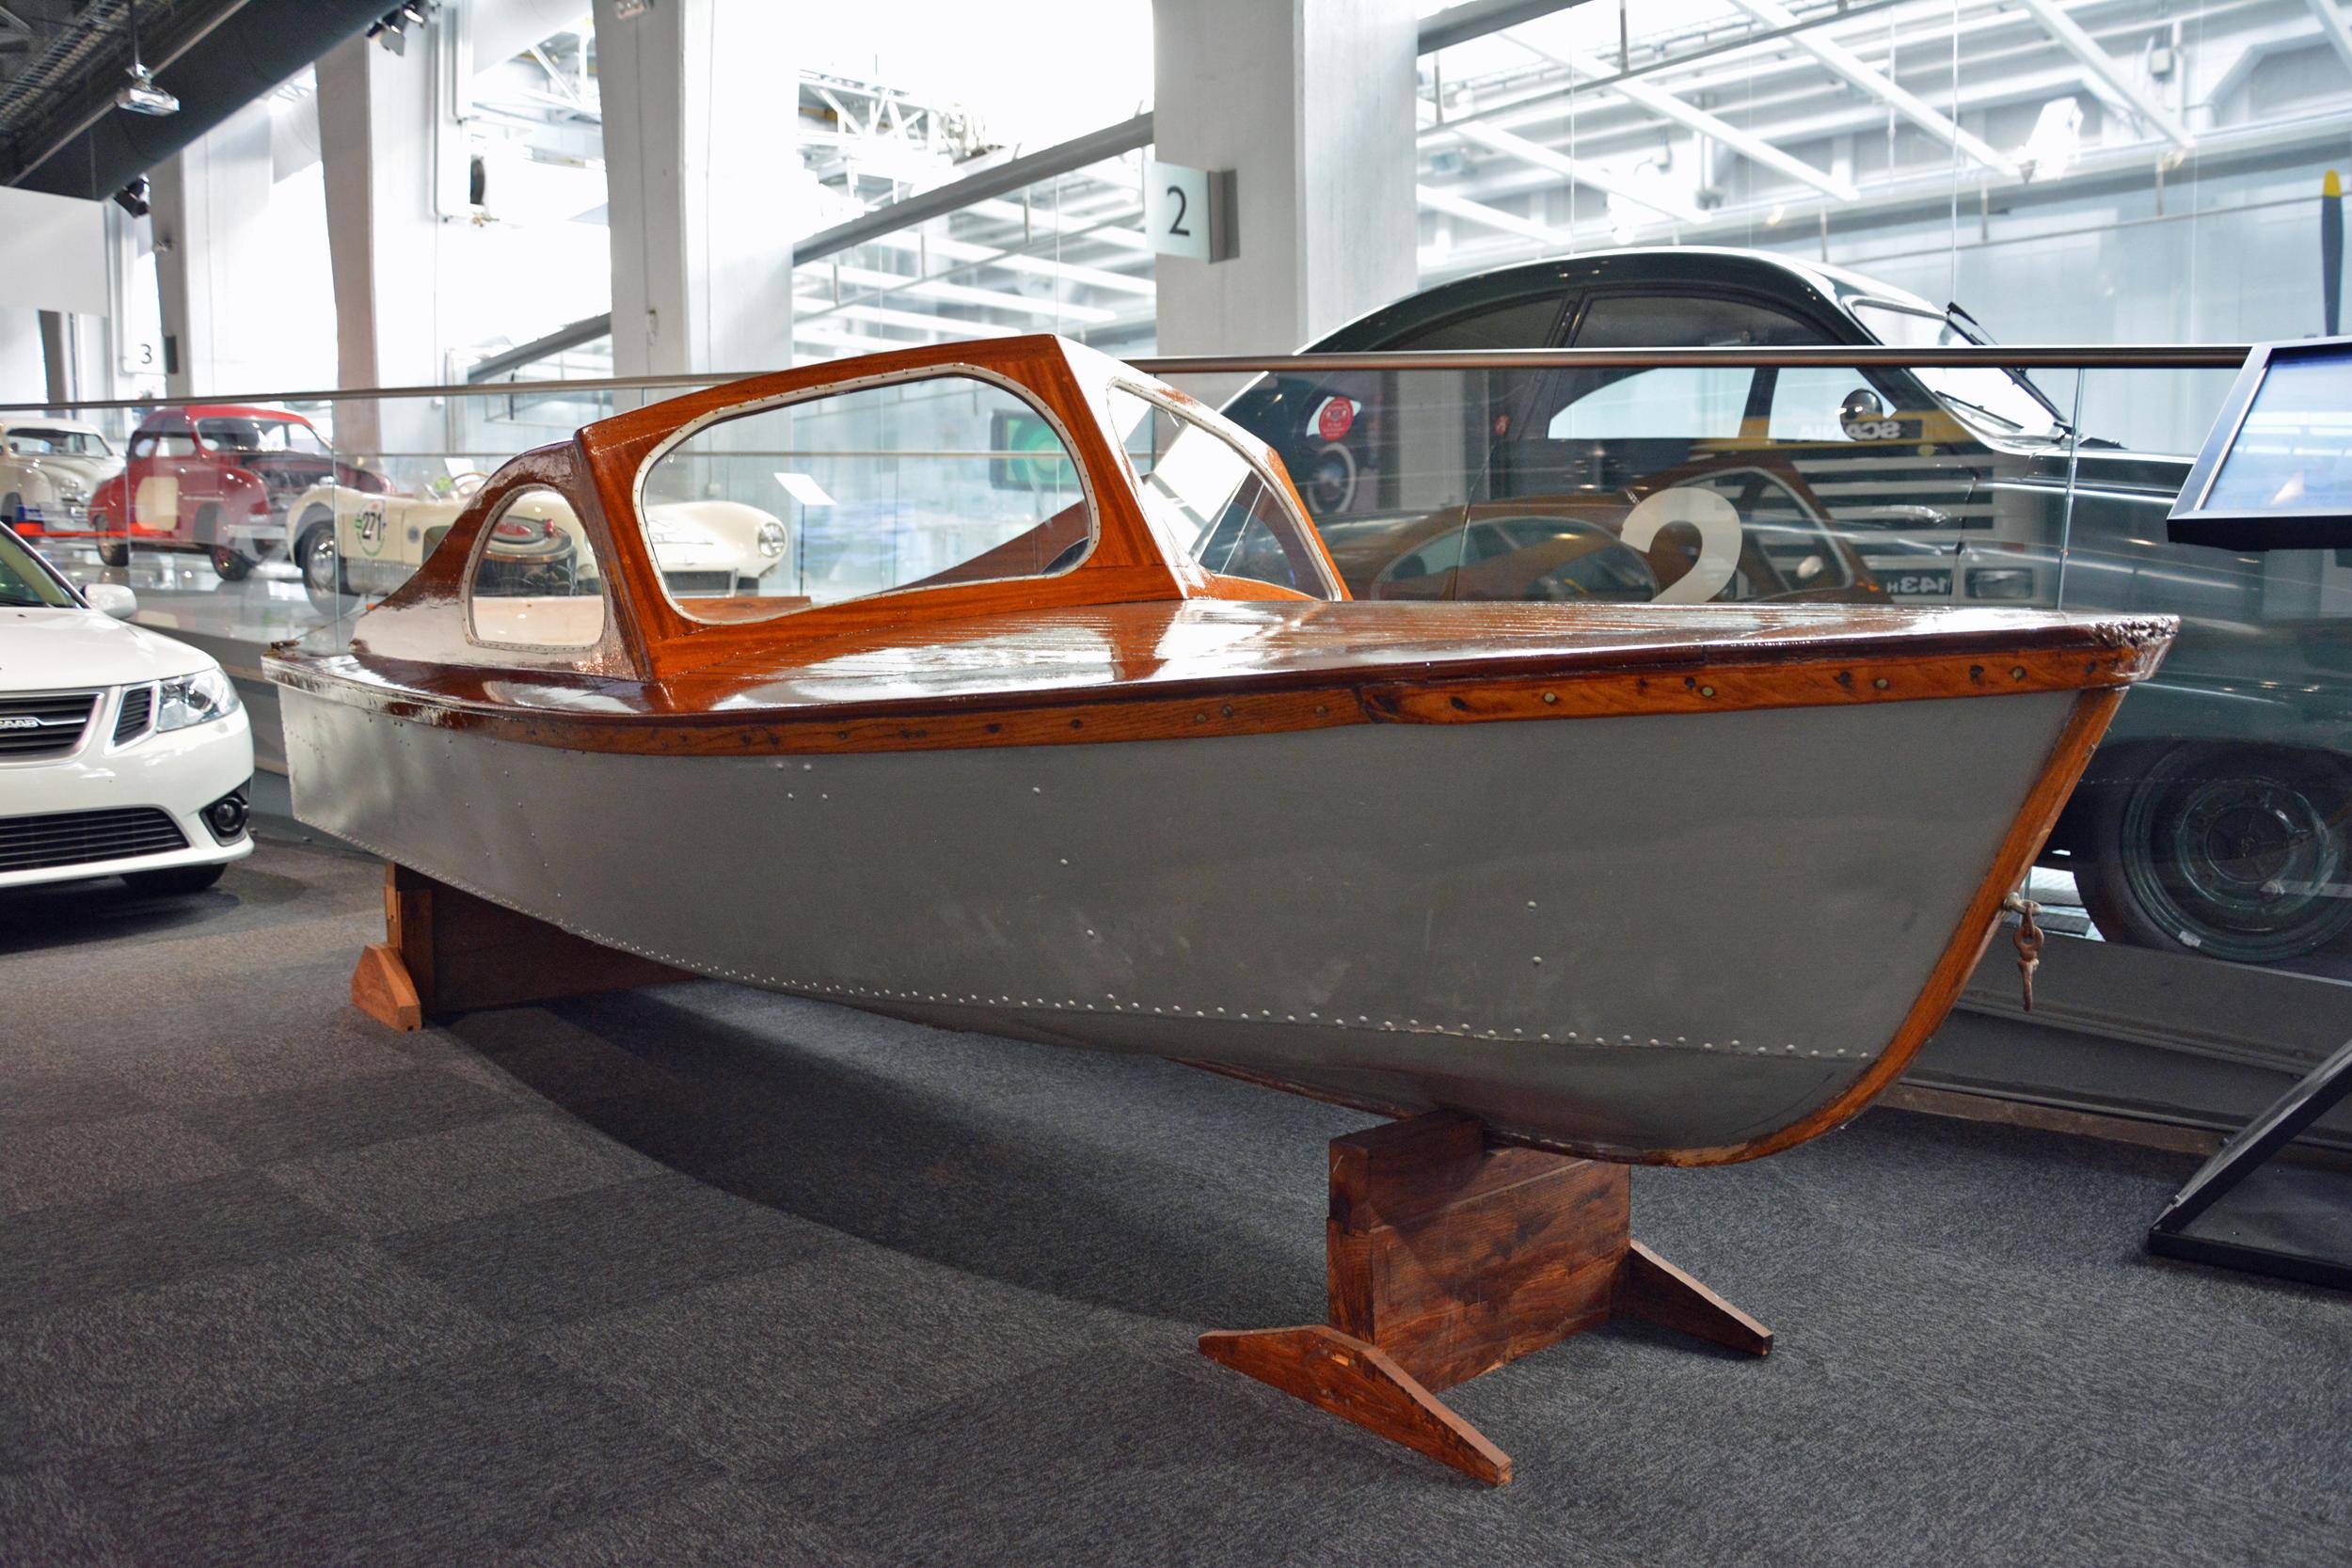 saab museum boat front three quarter